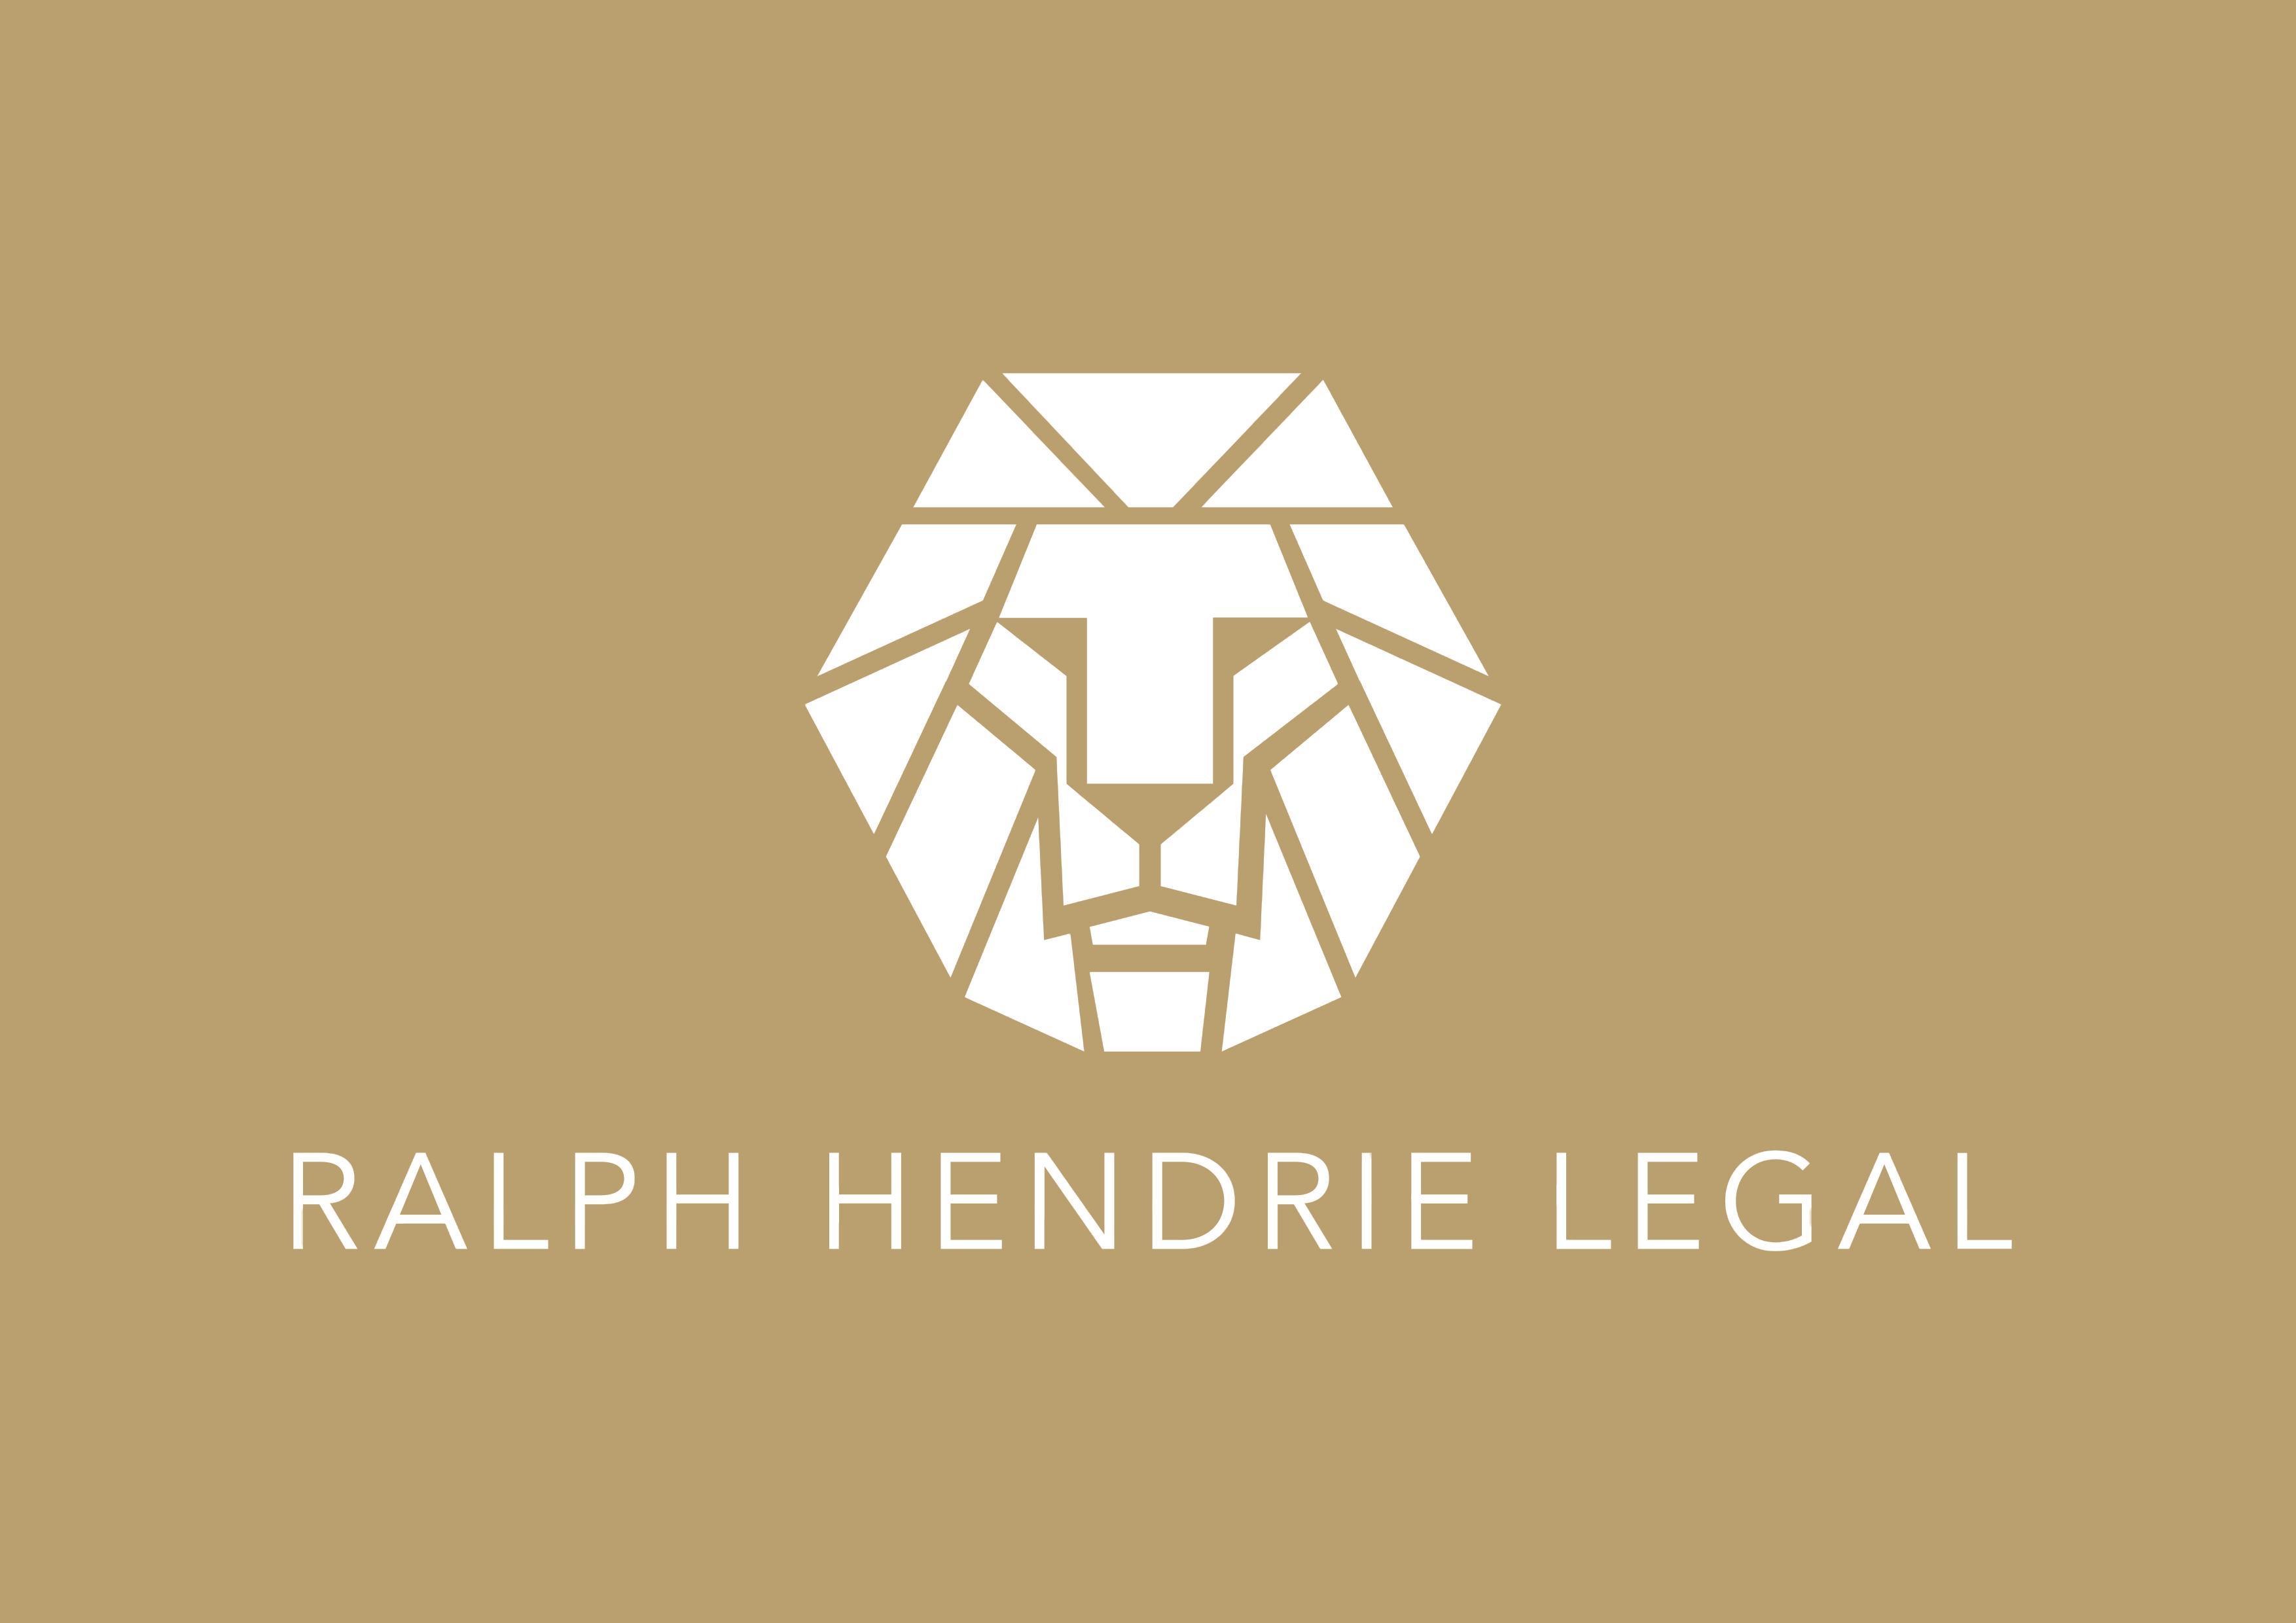 Ralph Hendrie Legal